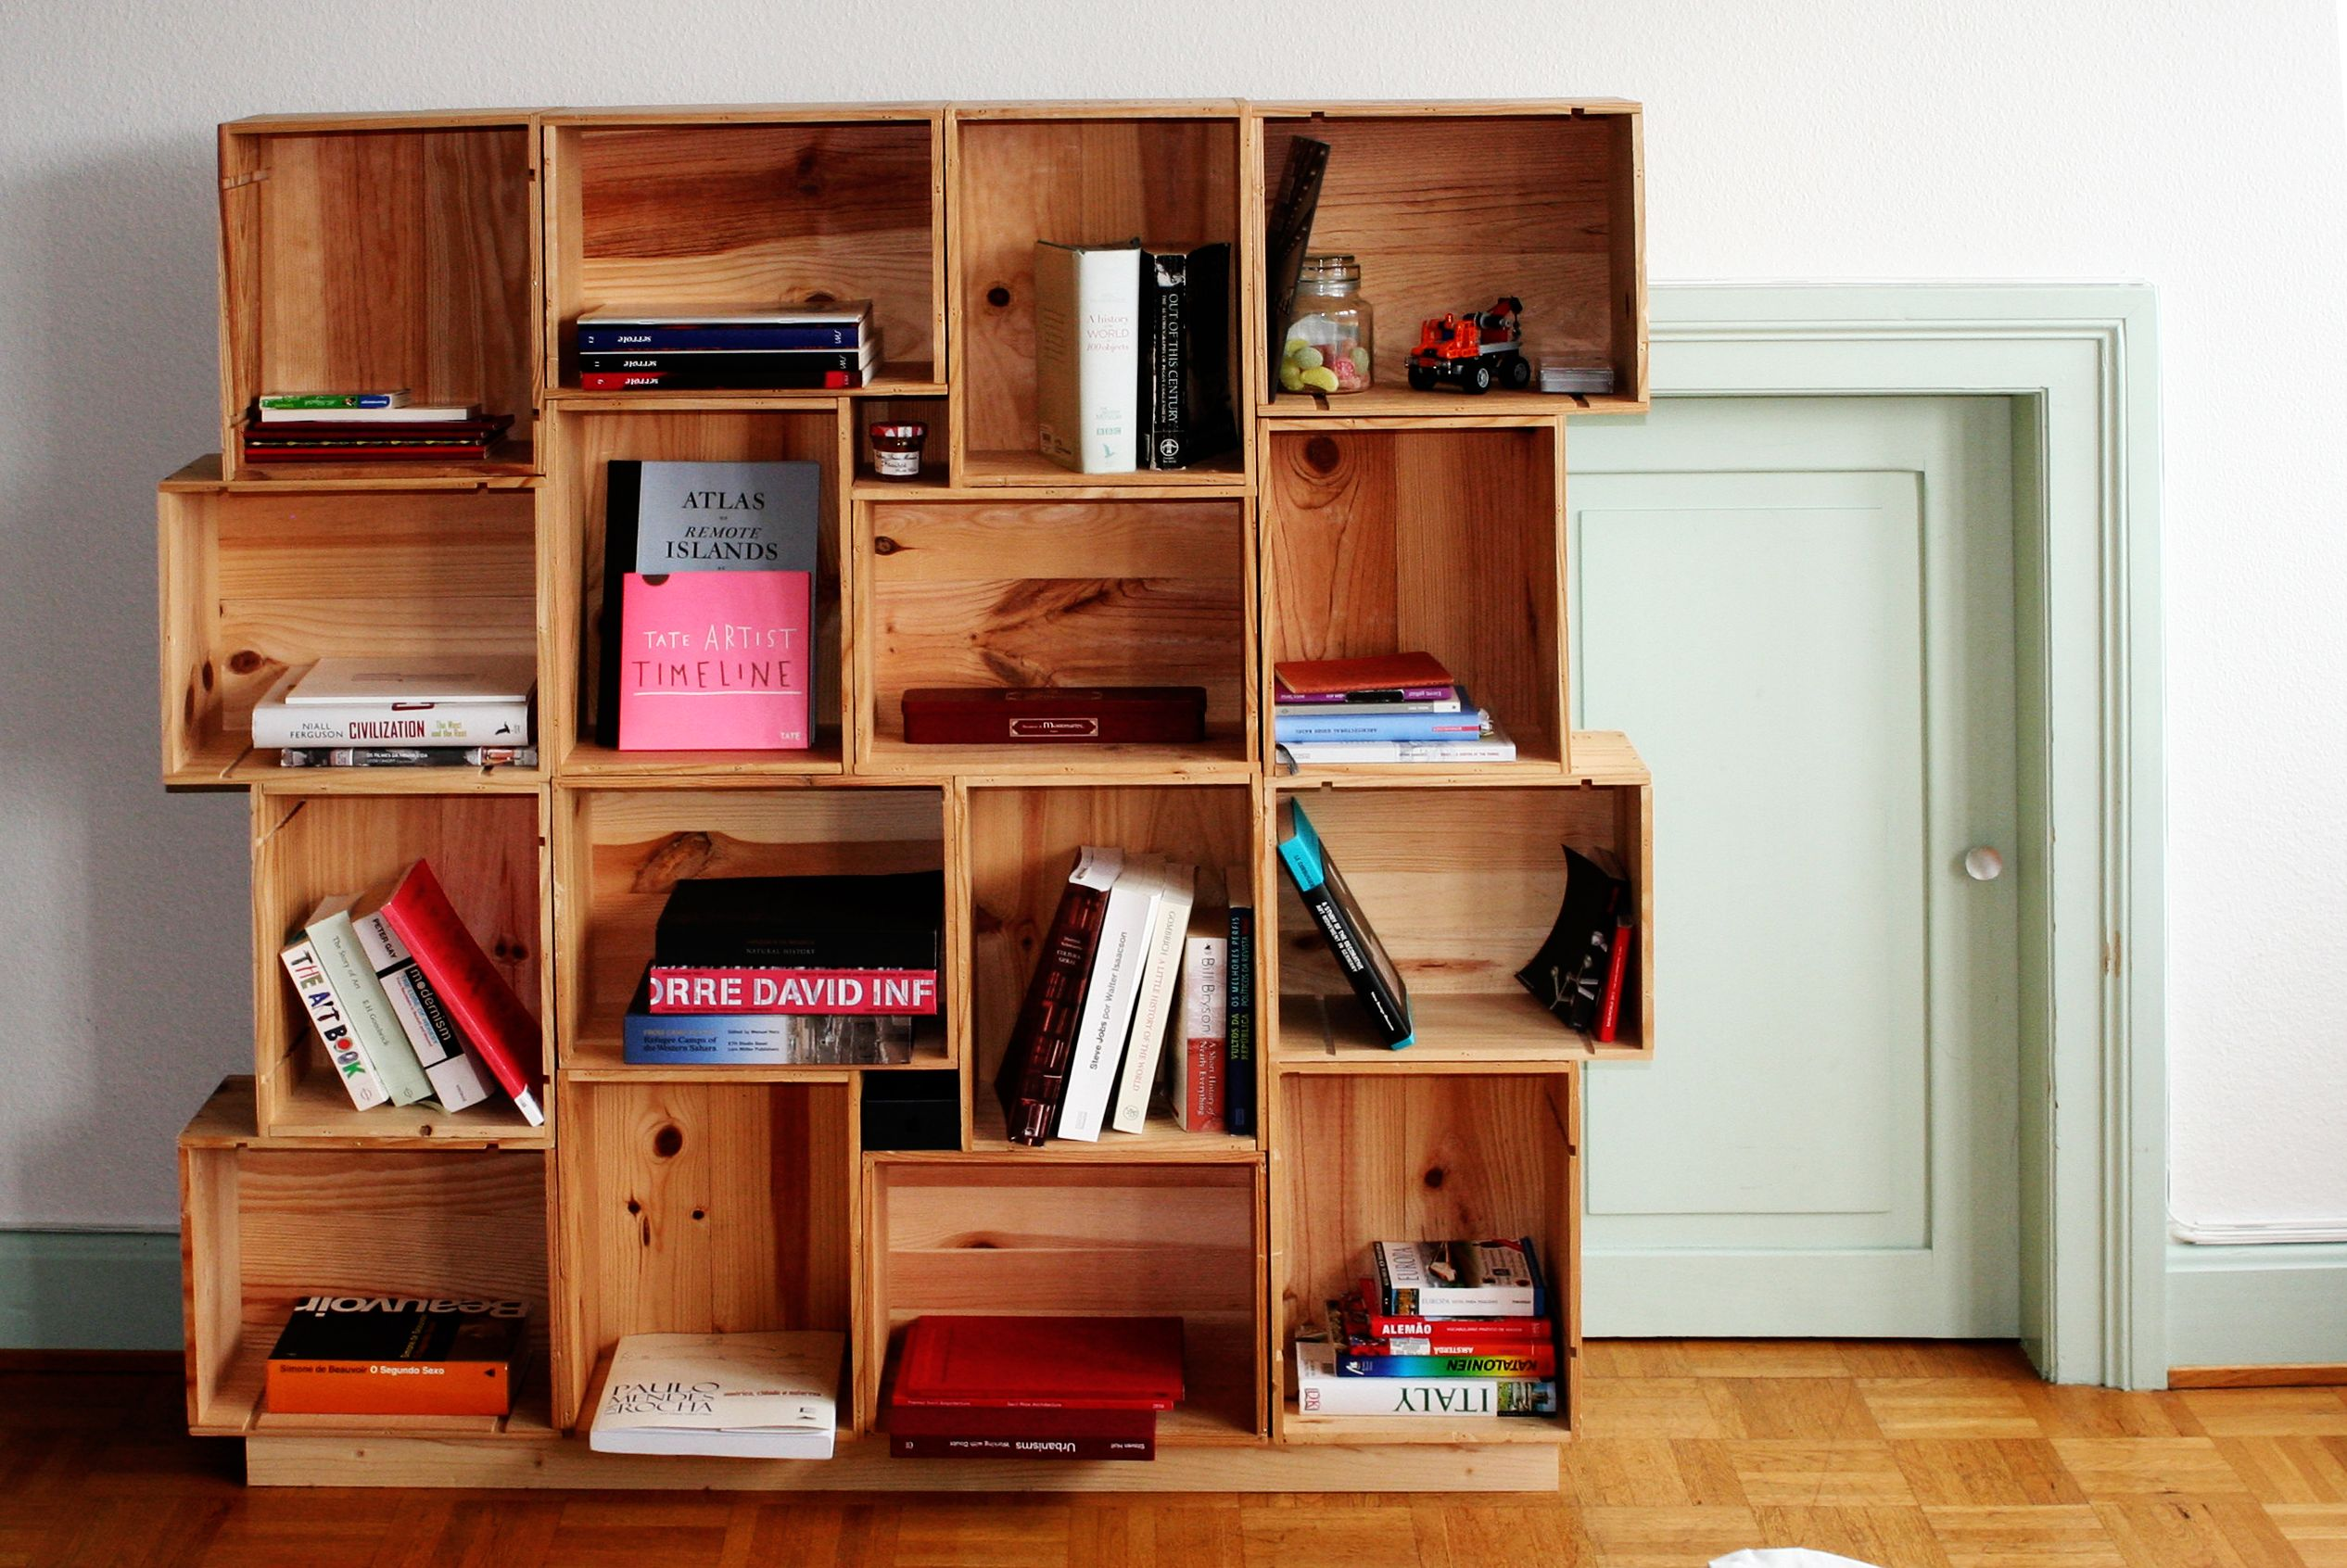 17 Best images about Hone Decor Shelves on Pinterest | Creative, Box shelves  and Dvd wall shelf